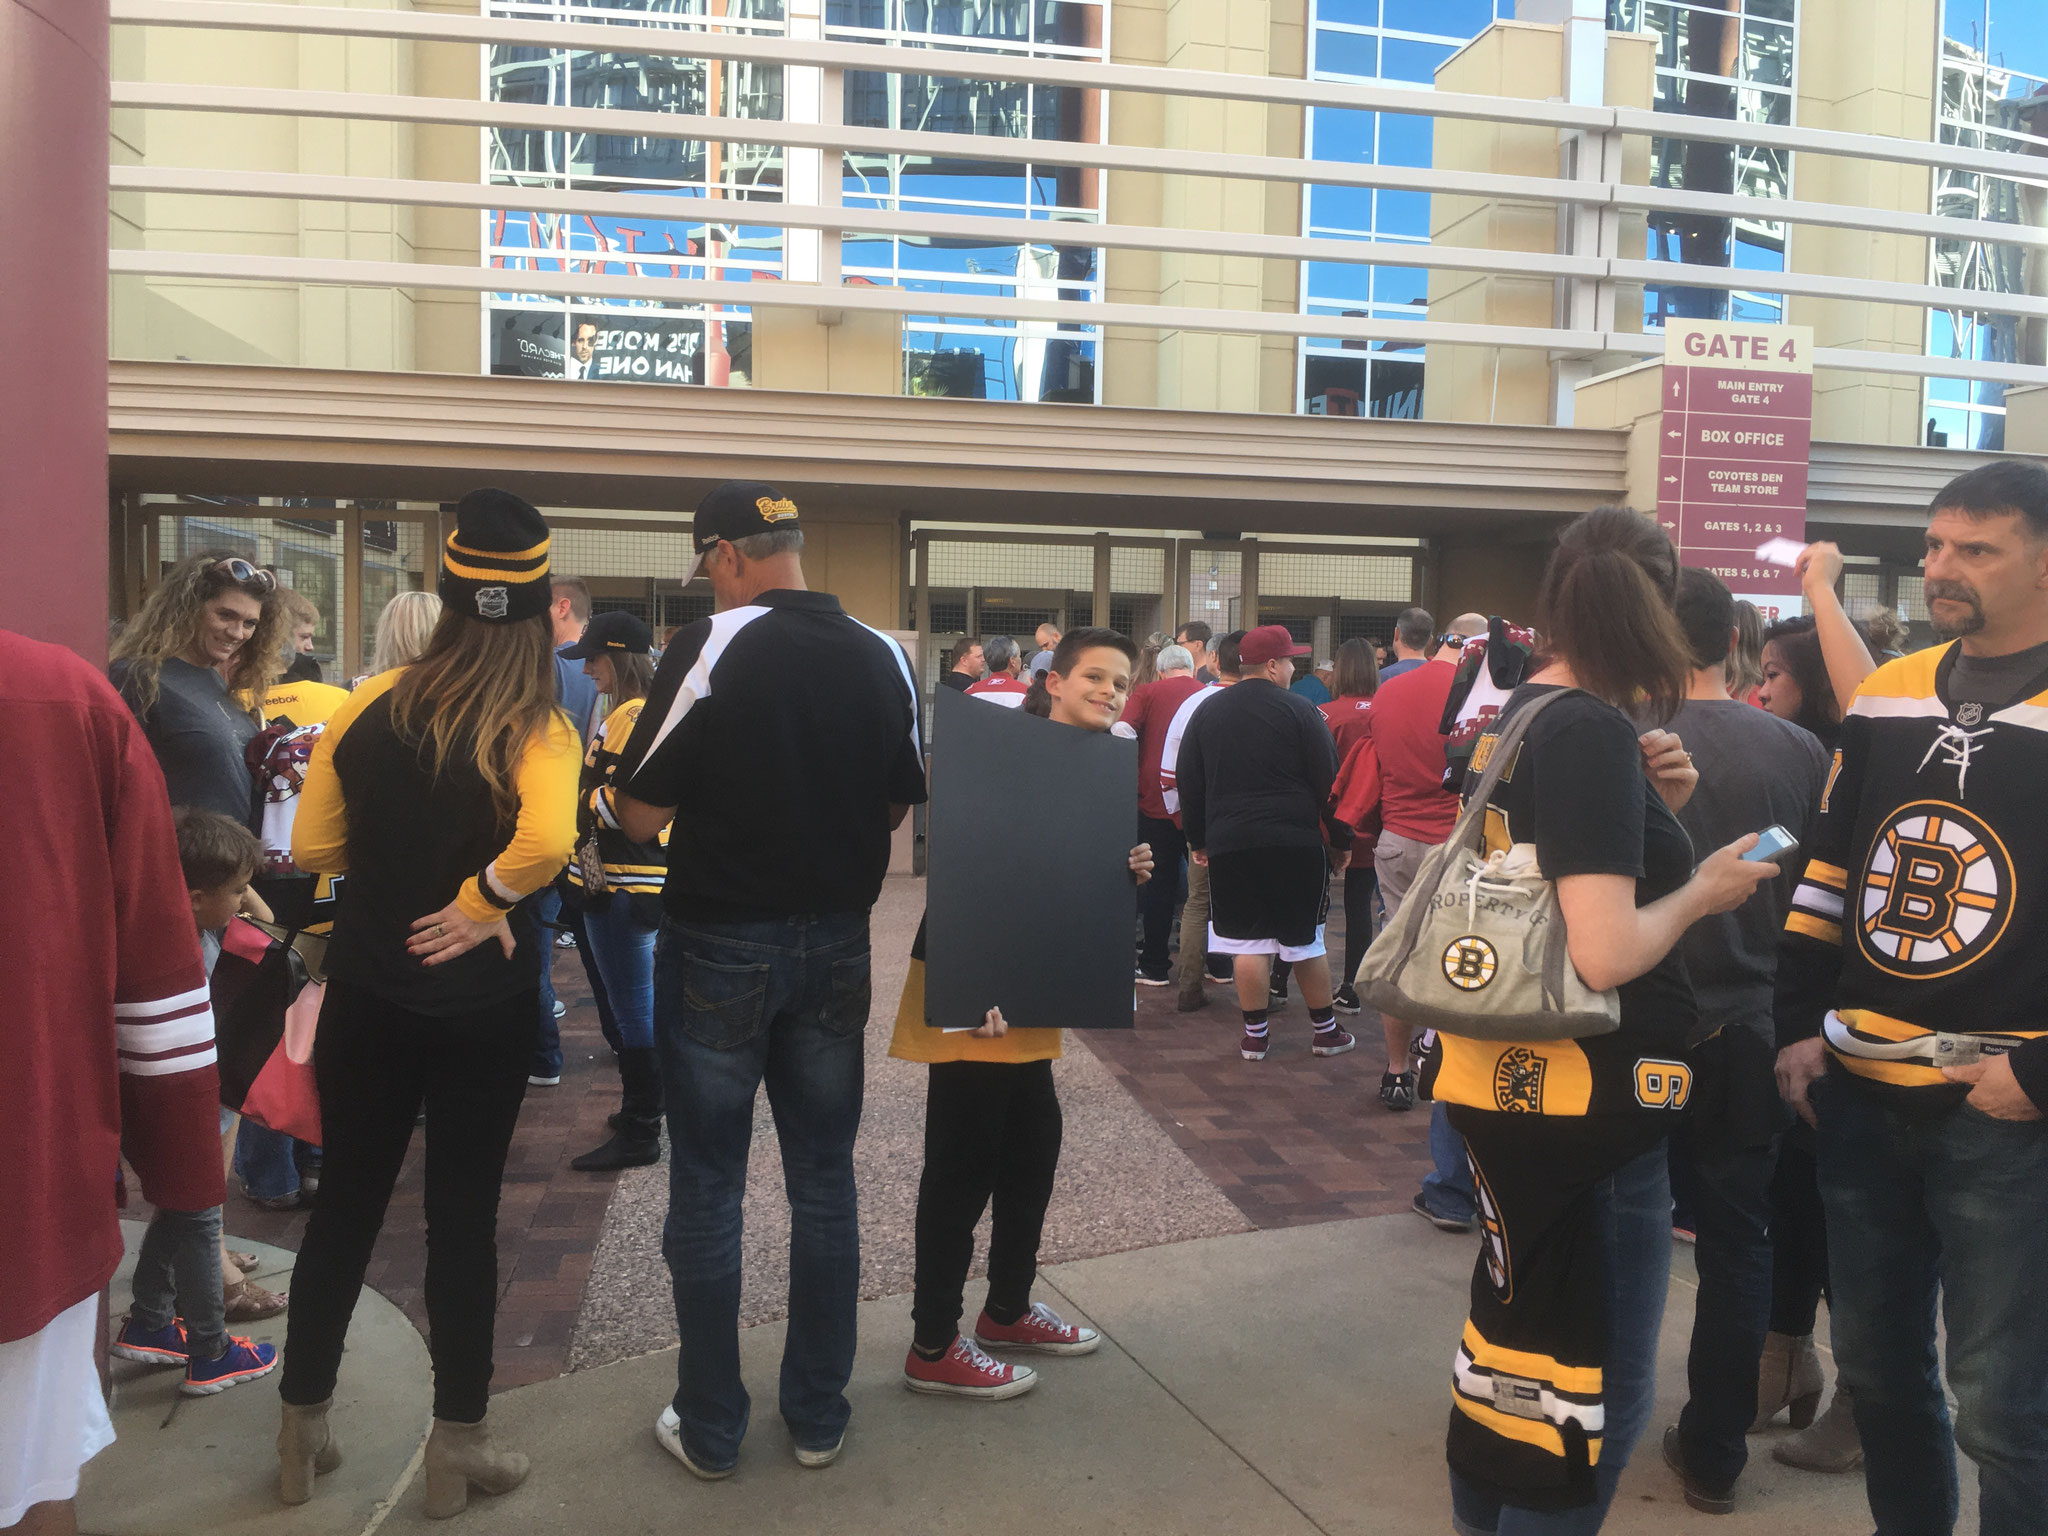 Devant la Gila River Arena : Arizona Coyotes vs Boston Bruins (2017/18)